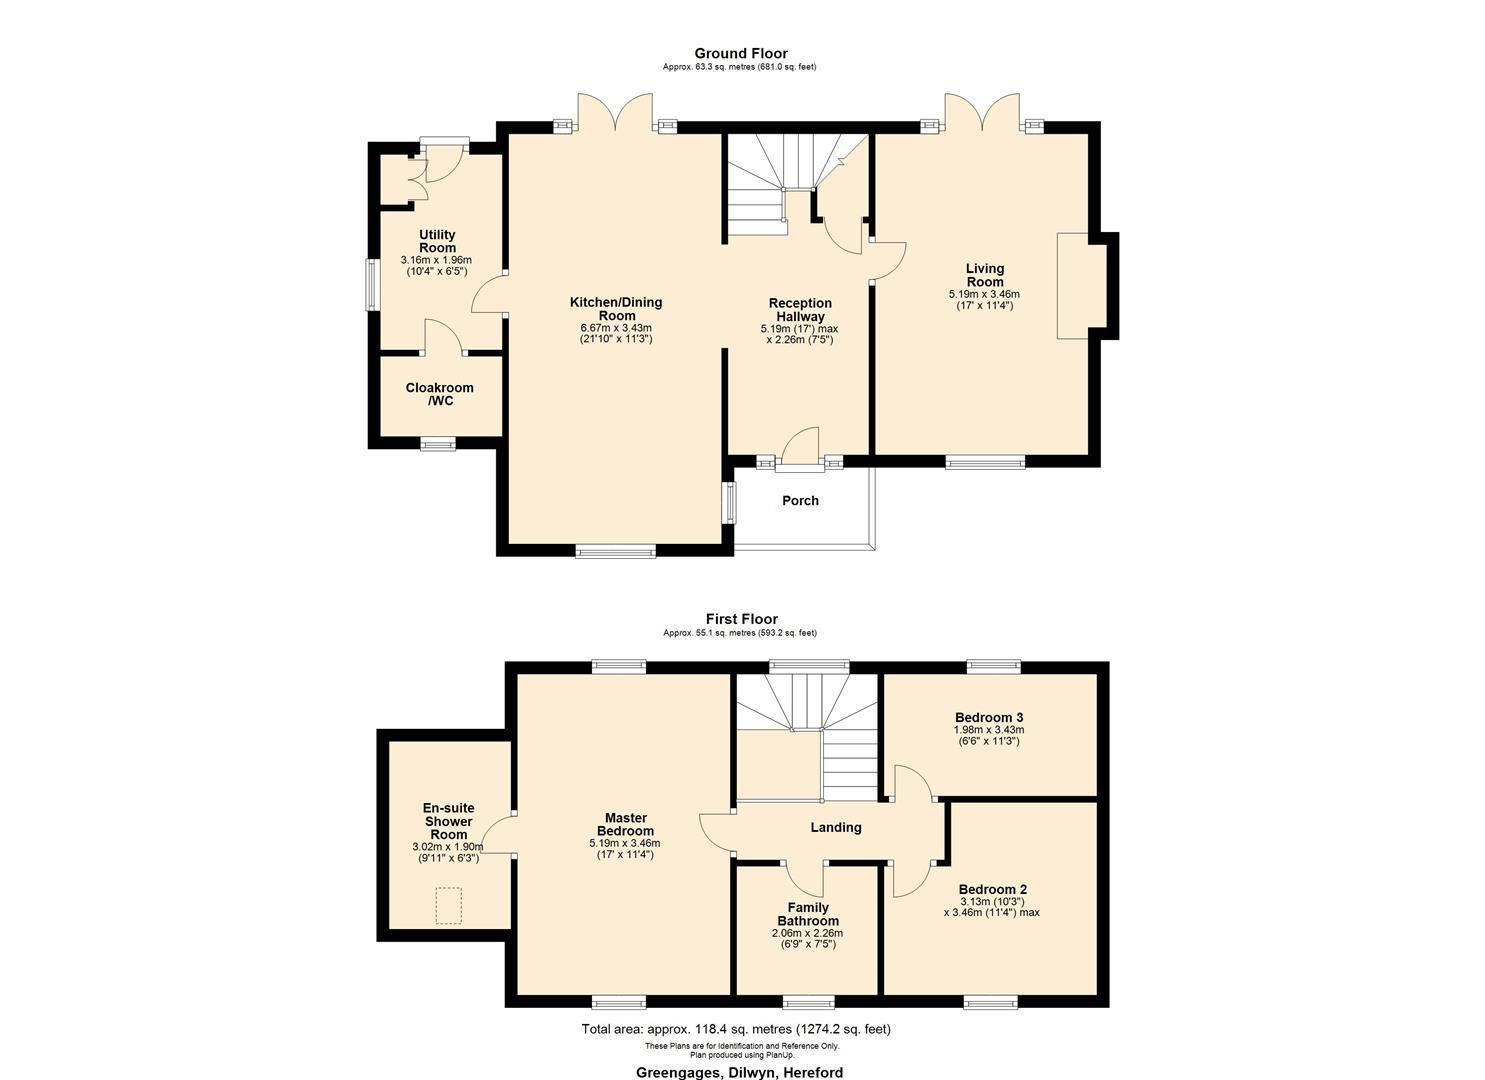 3 bed detached for sale in Dilwyn - Property Floorplan